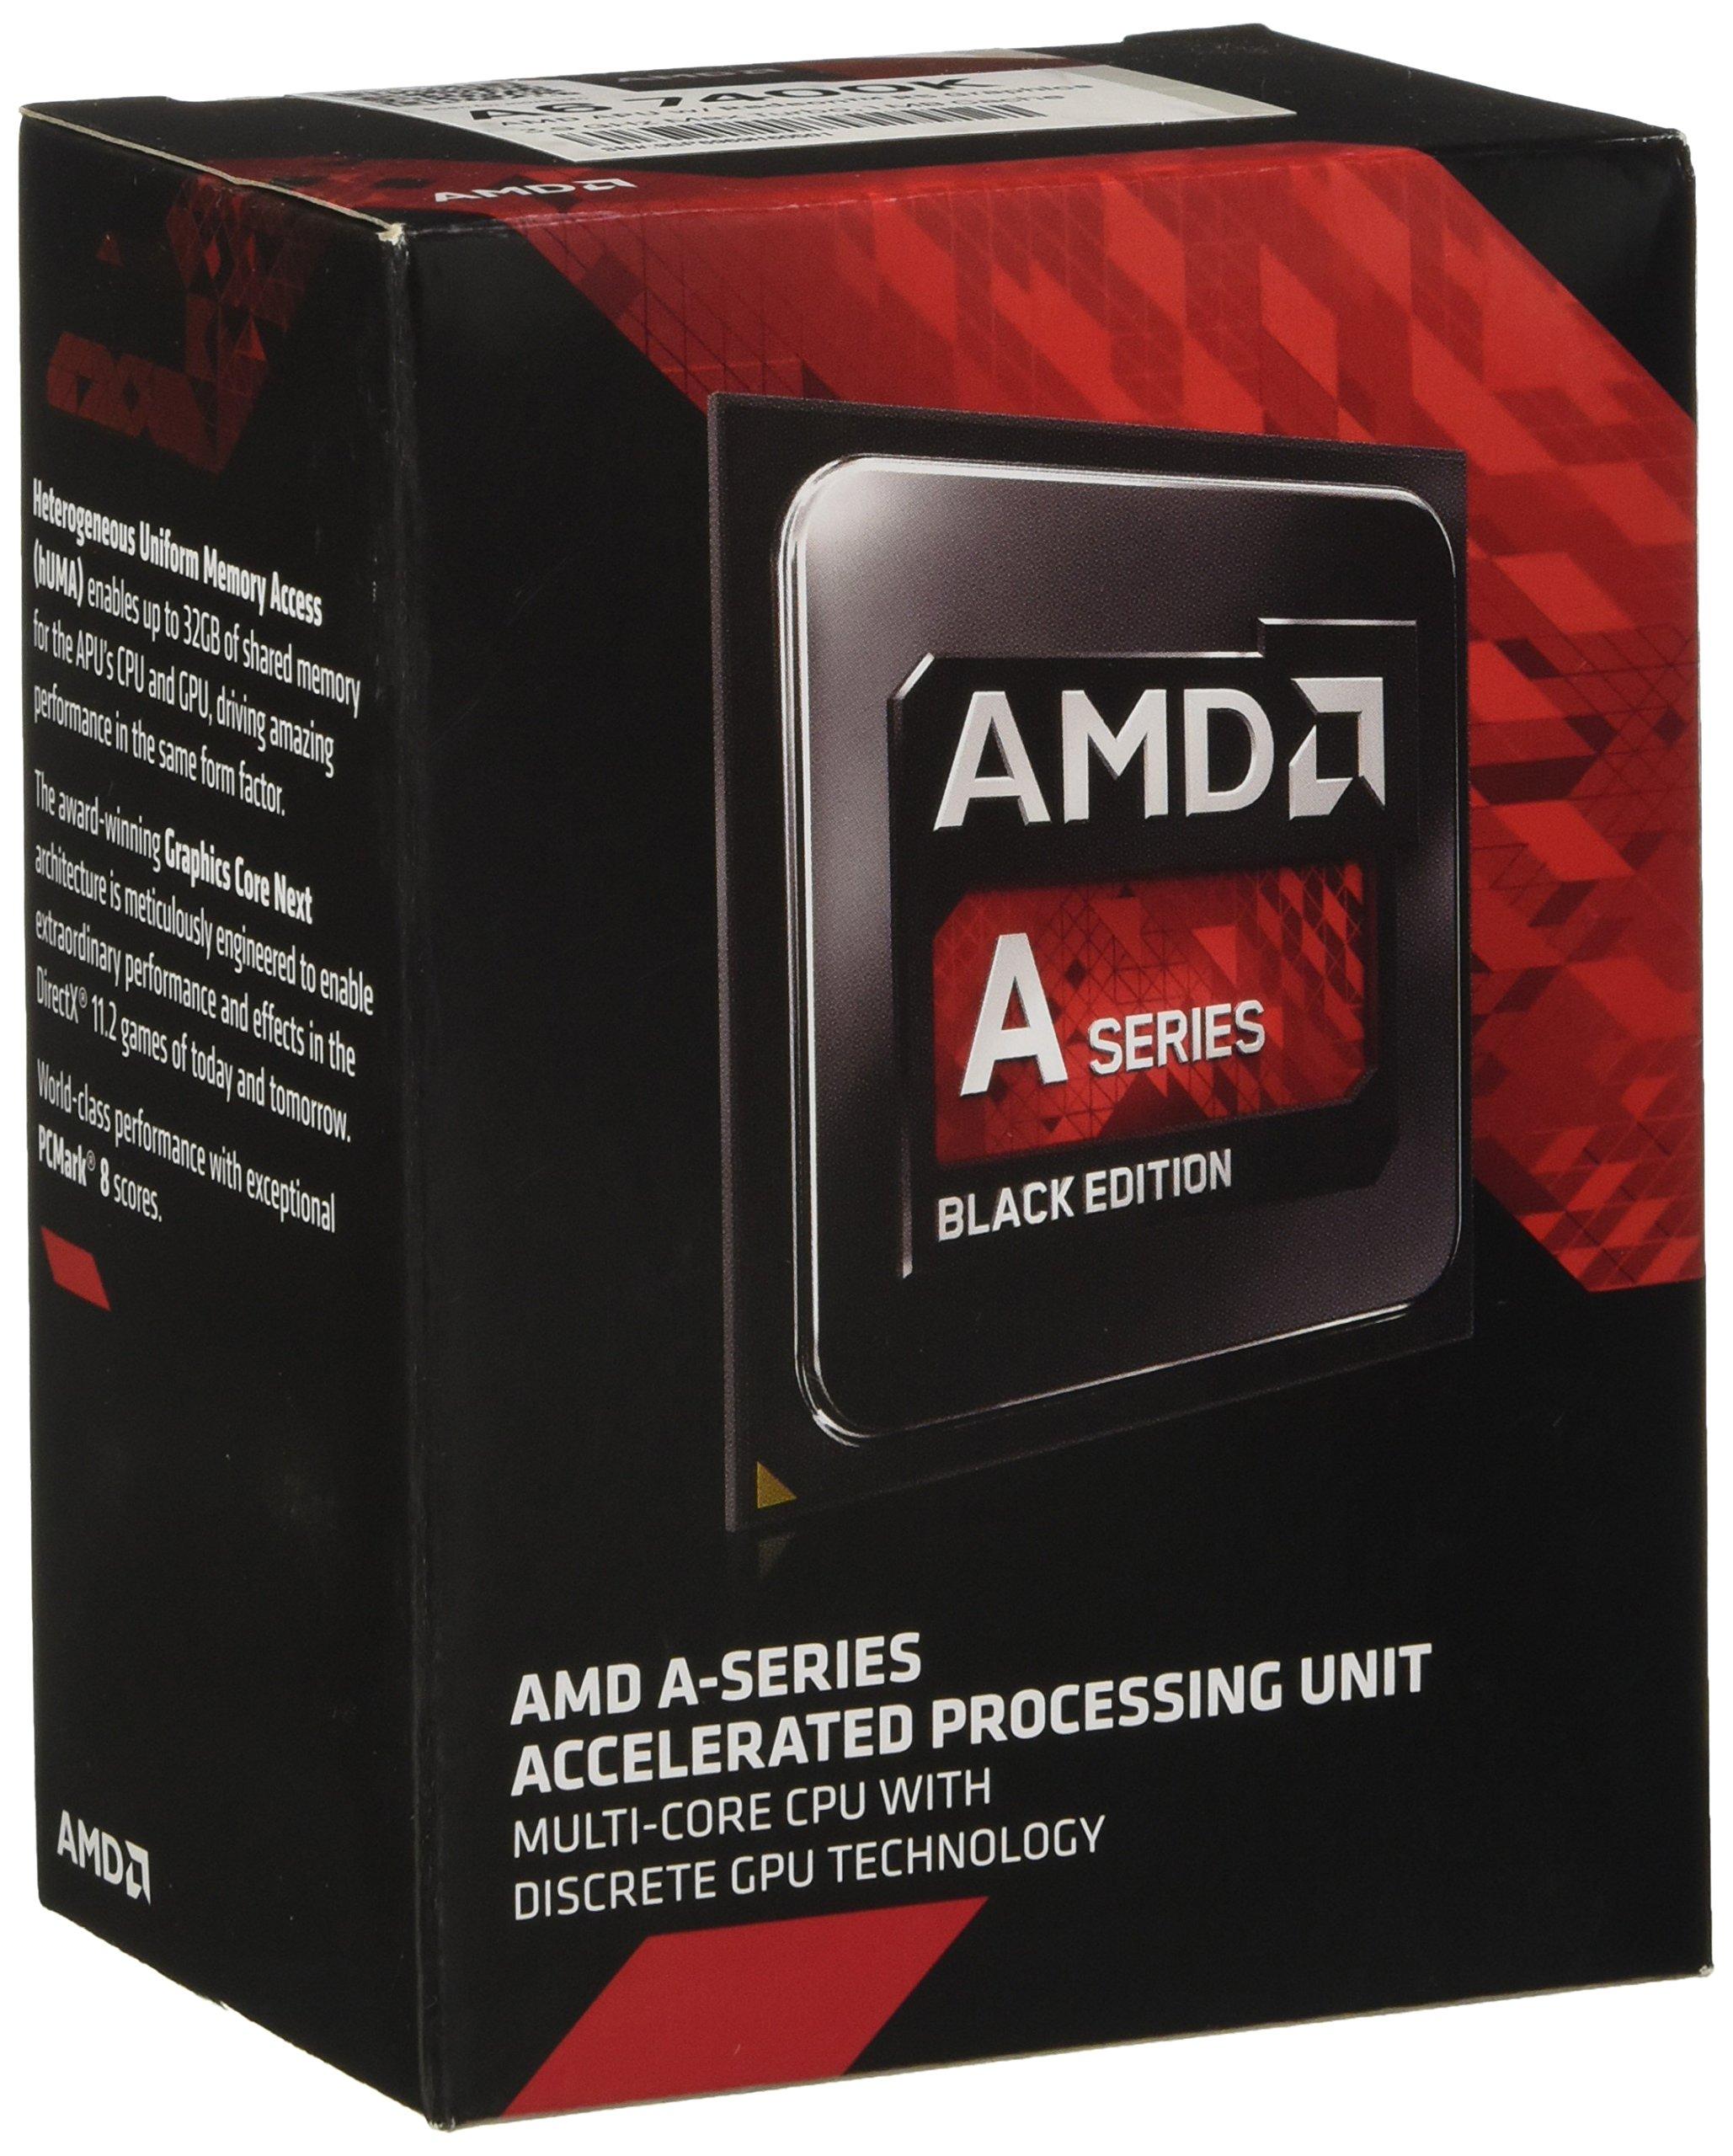 AMD AMD A6-7400K Dual-Core 3.5 GHz Socket FM2+ Desktop Processor Radeon R5 Series (AD740KYBJABOX) by AMD